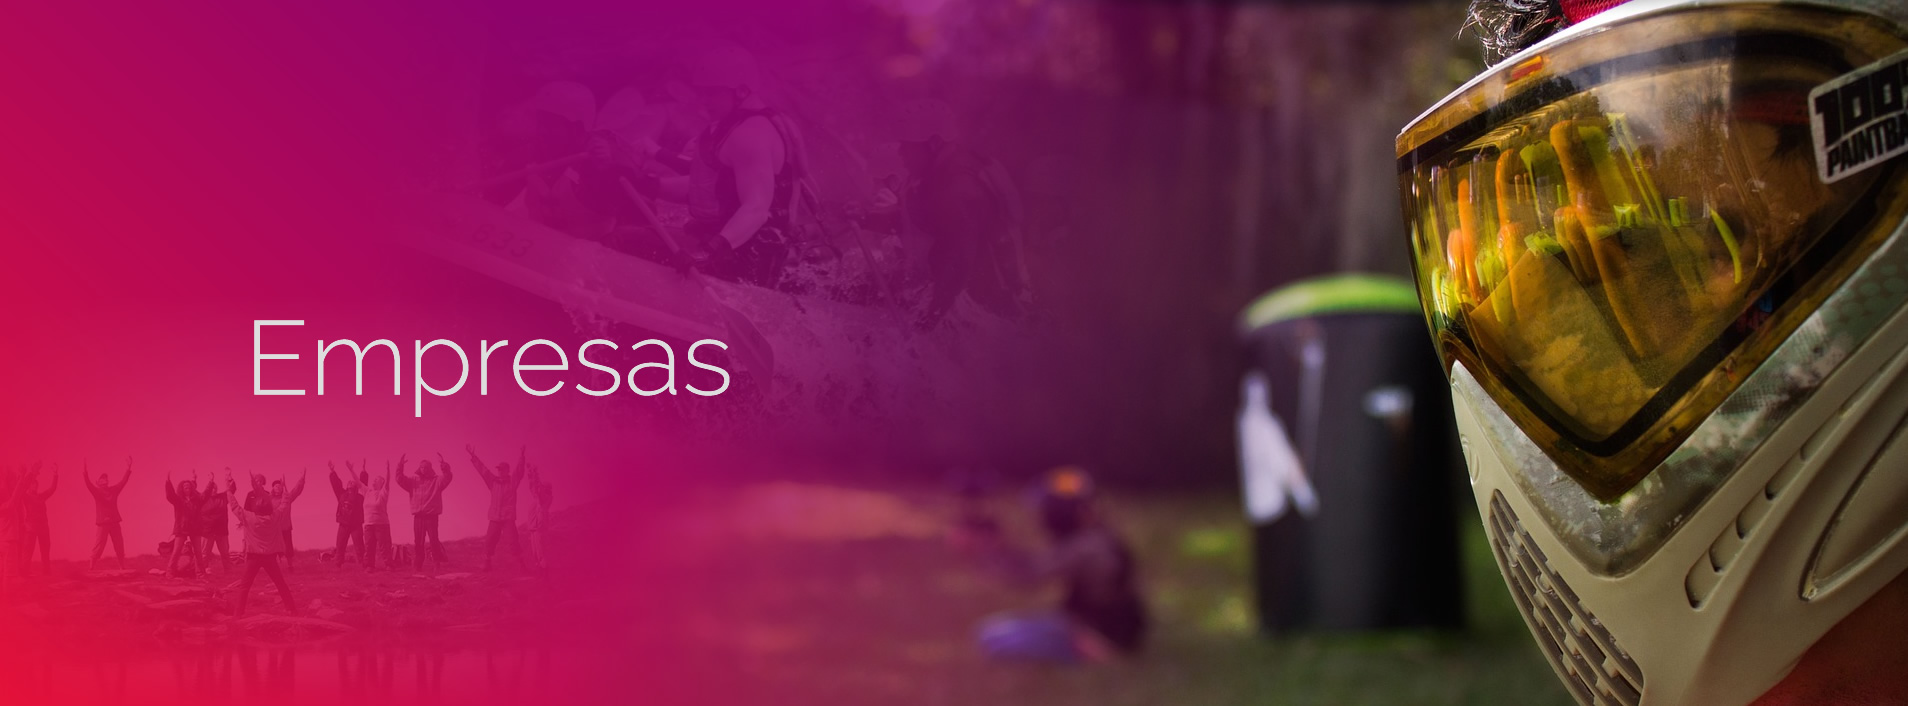 Empresas en aventurasport.es